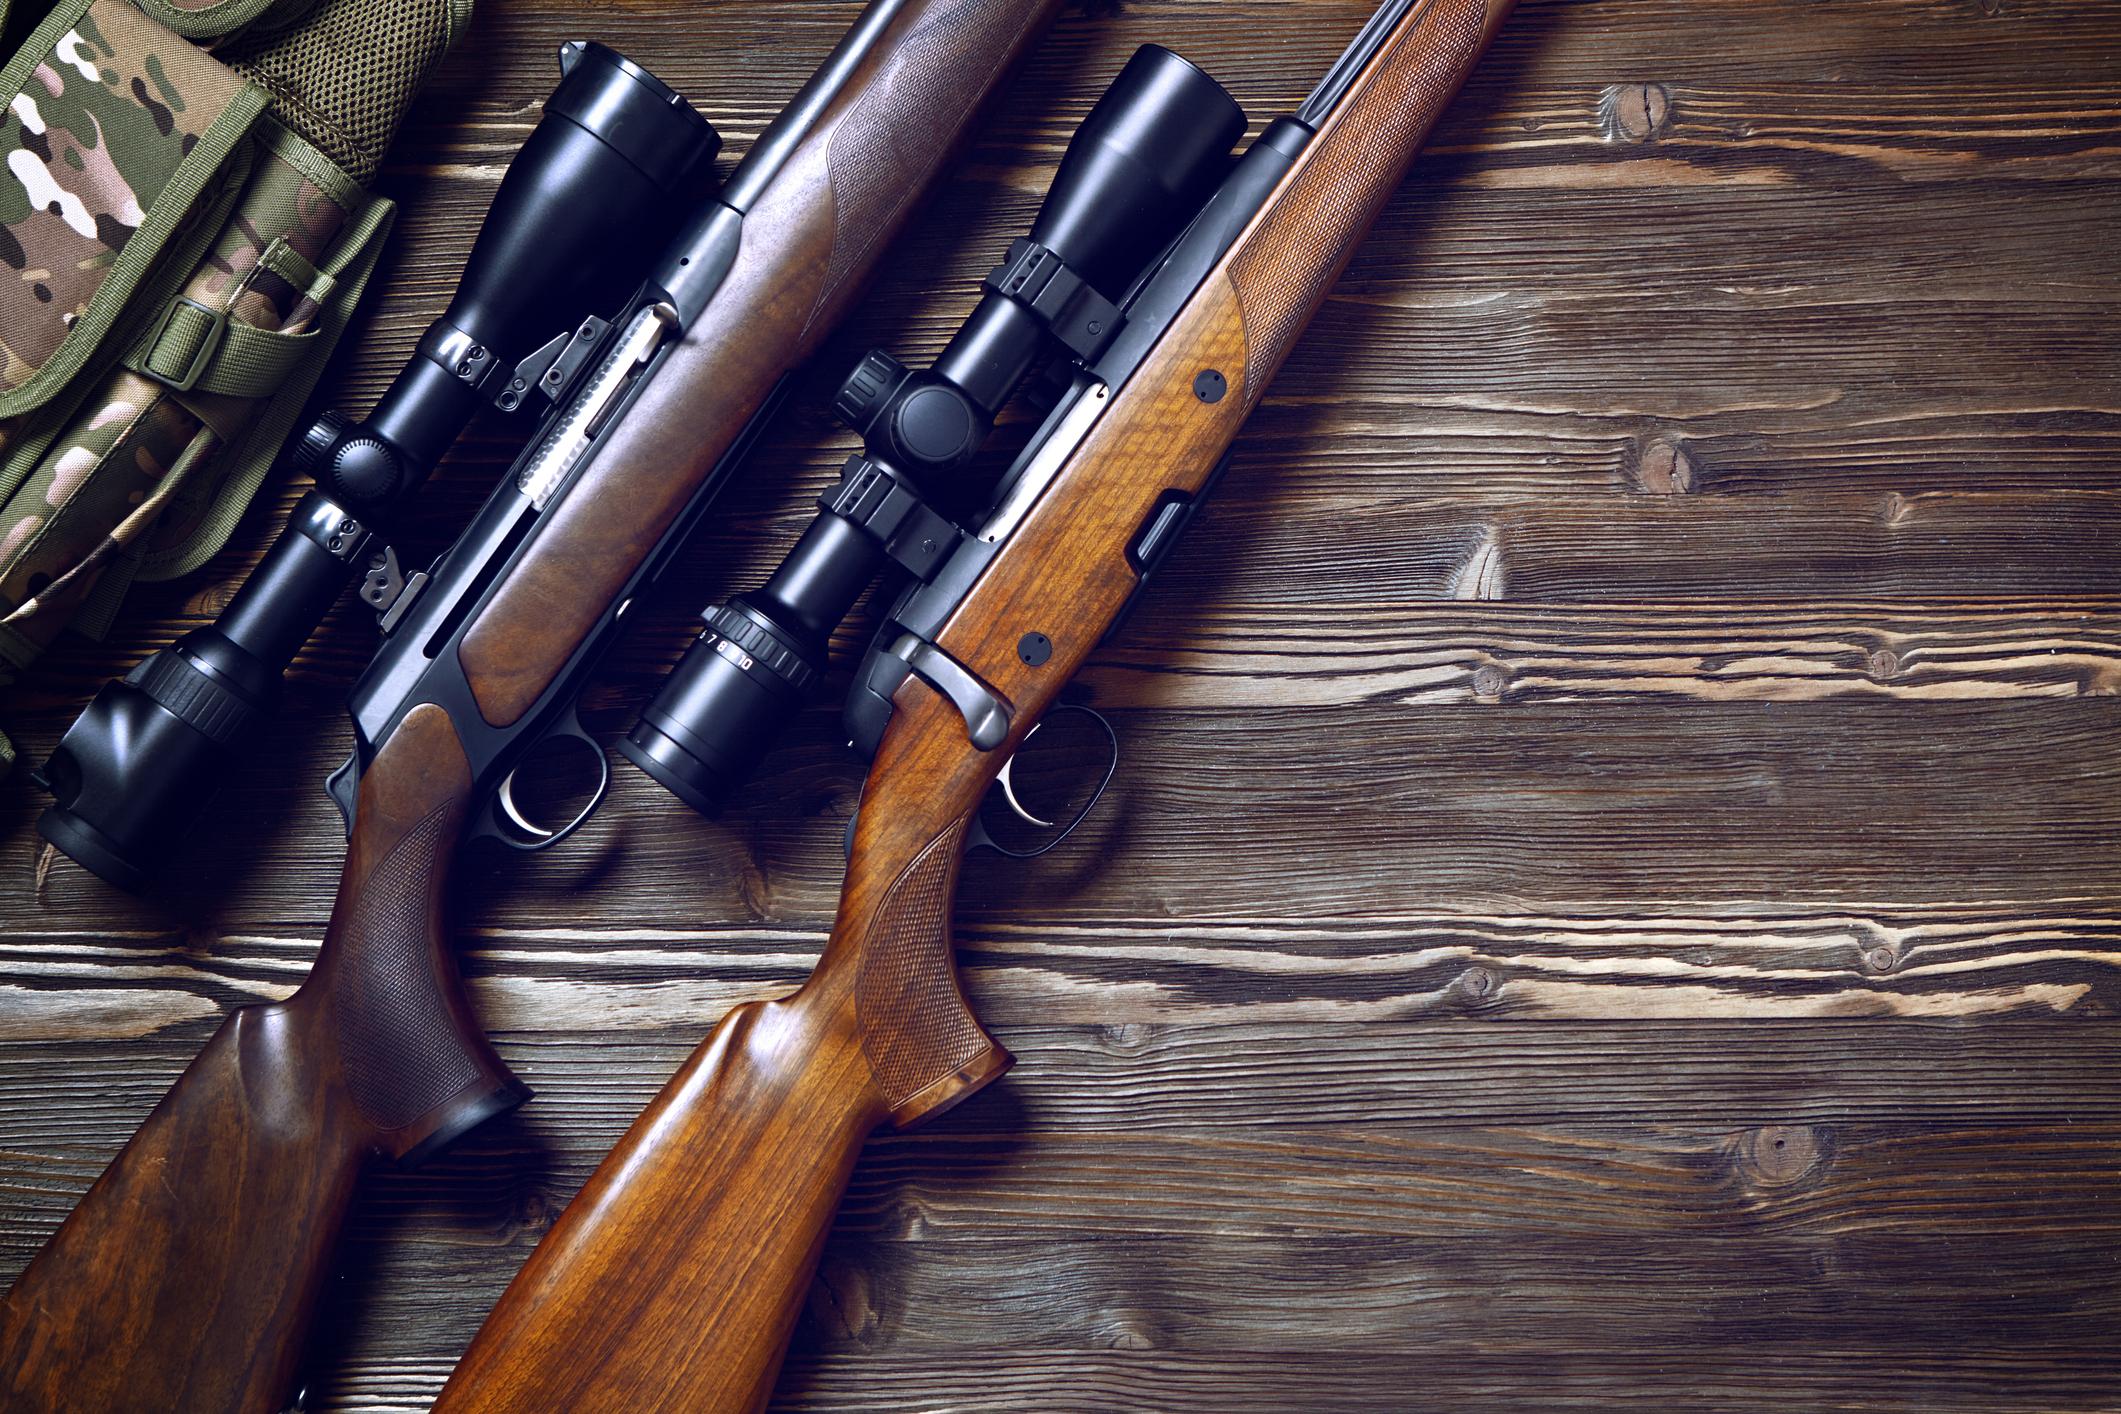 Guns on a wood table.